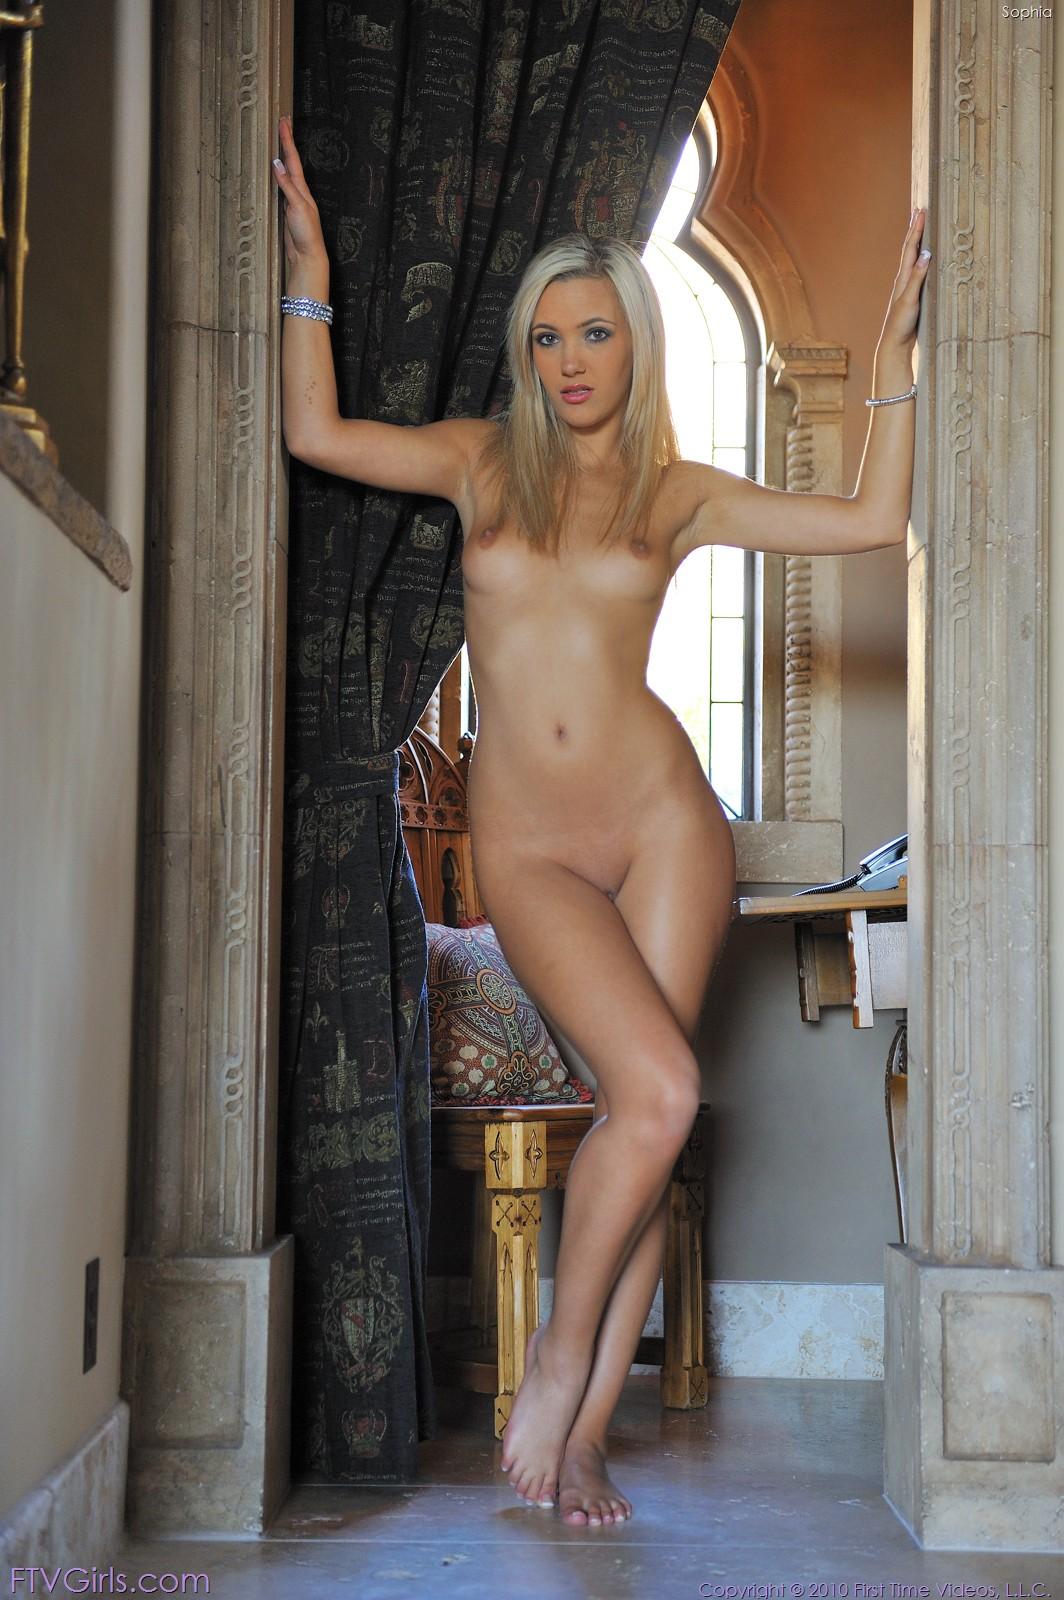 scotland-girls-nude-pics